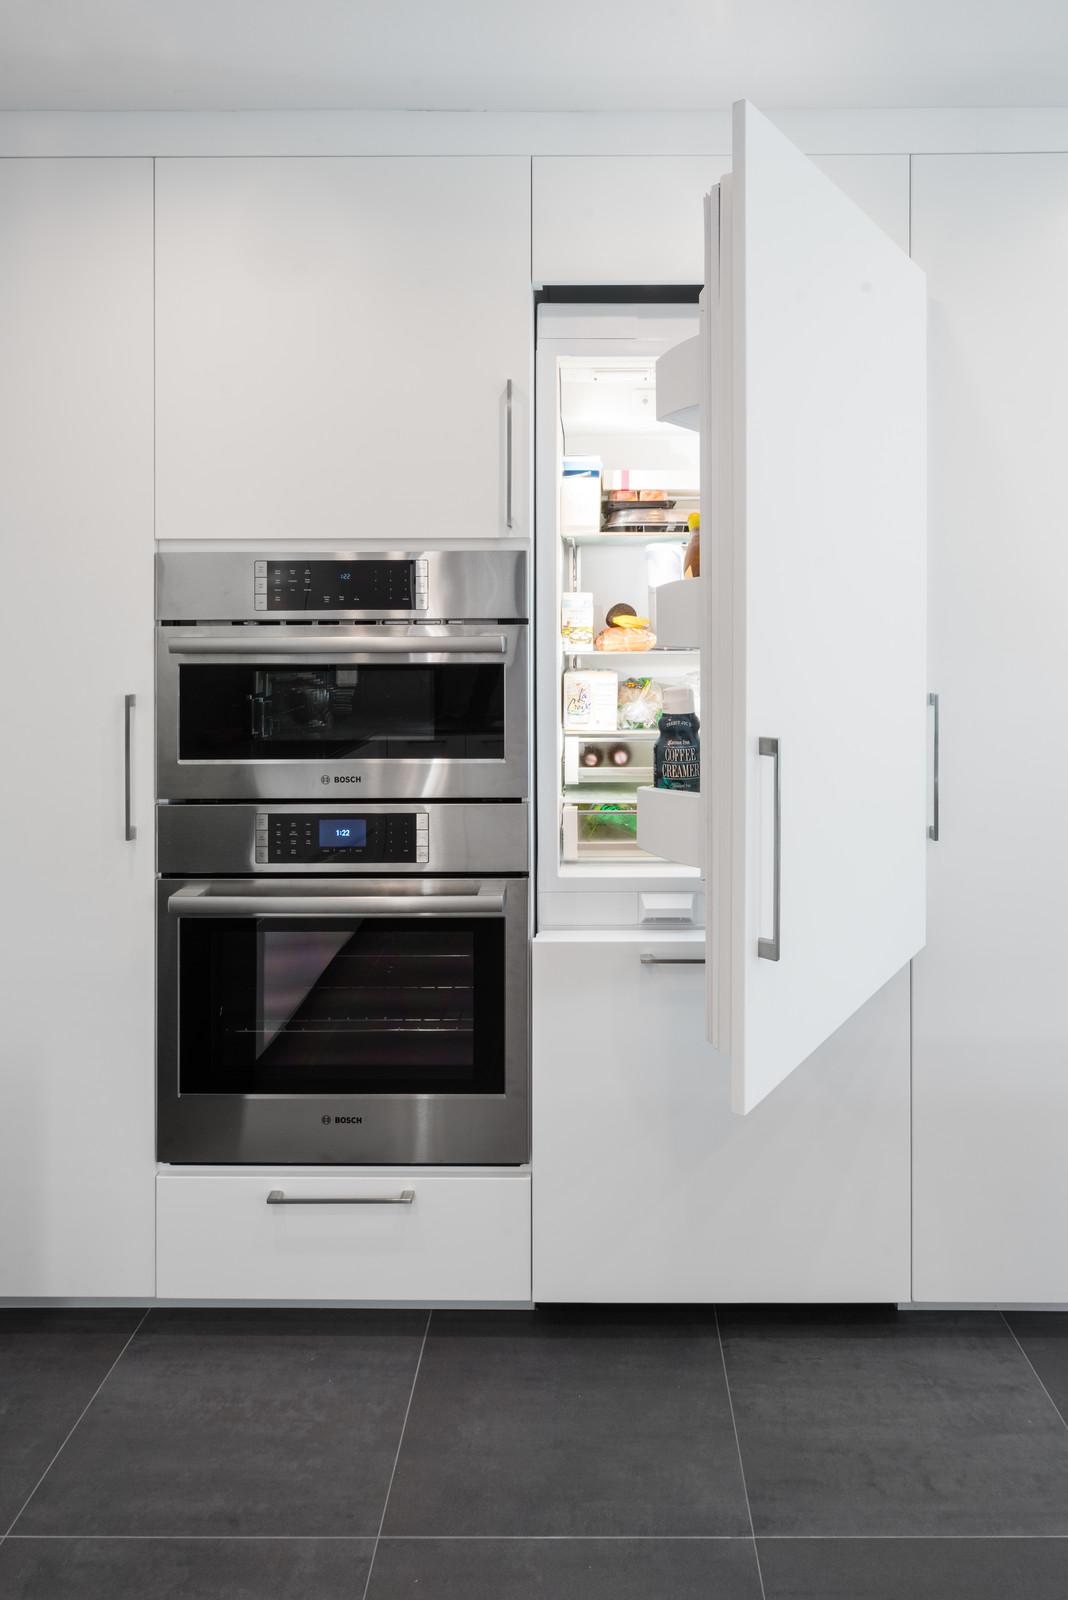 Une cuisine minimaliste imagin e par l 39 architecte dan brunn - Cuisine minimaliste ...